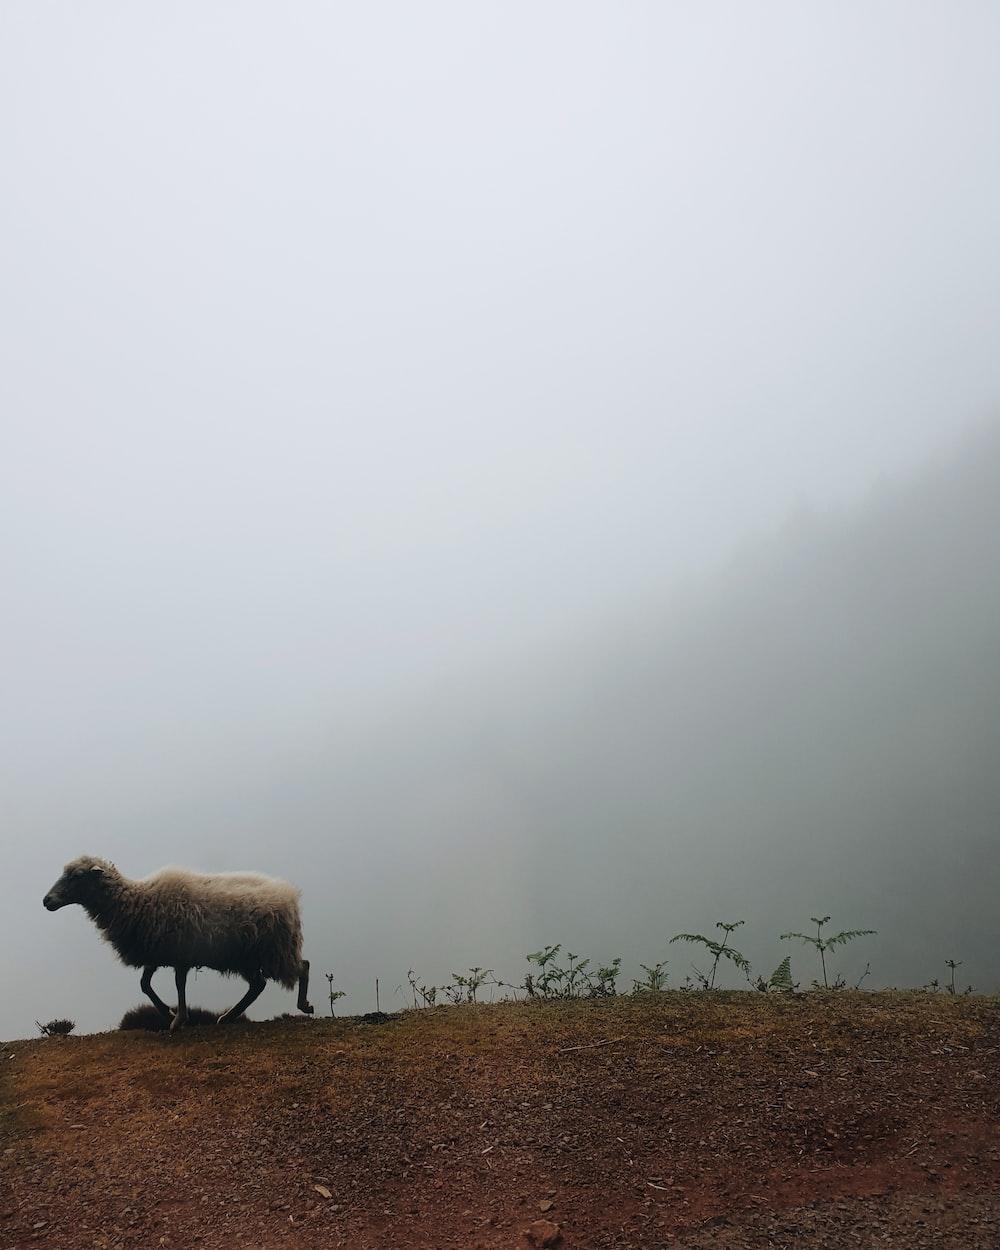 beige sheep on mountain